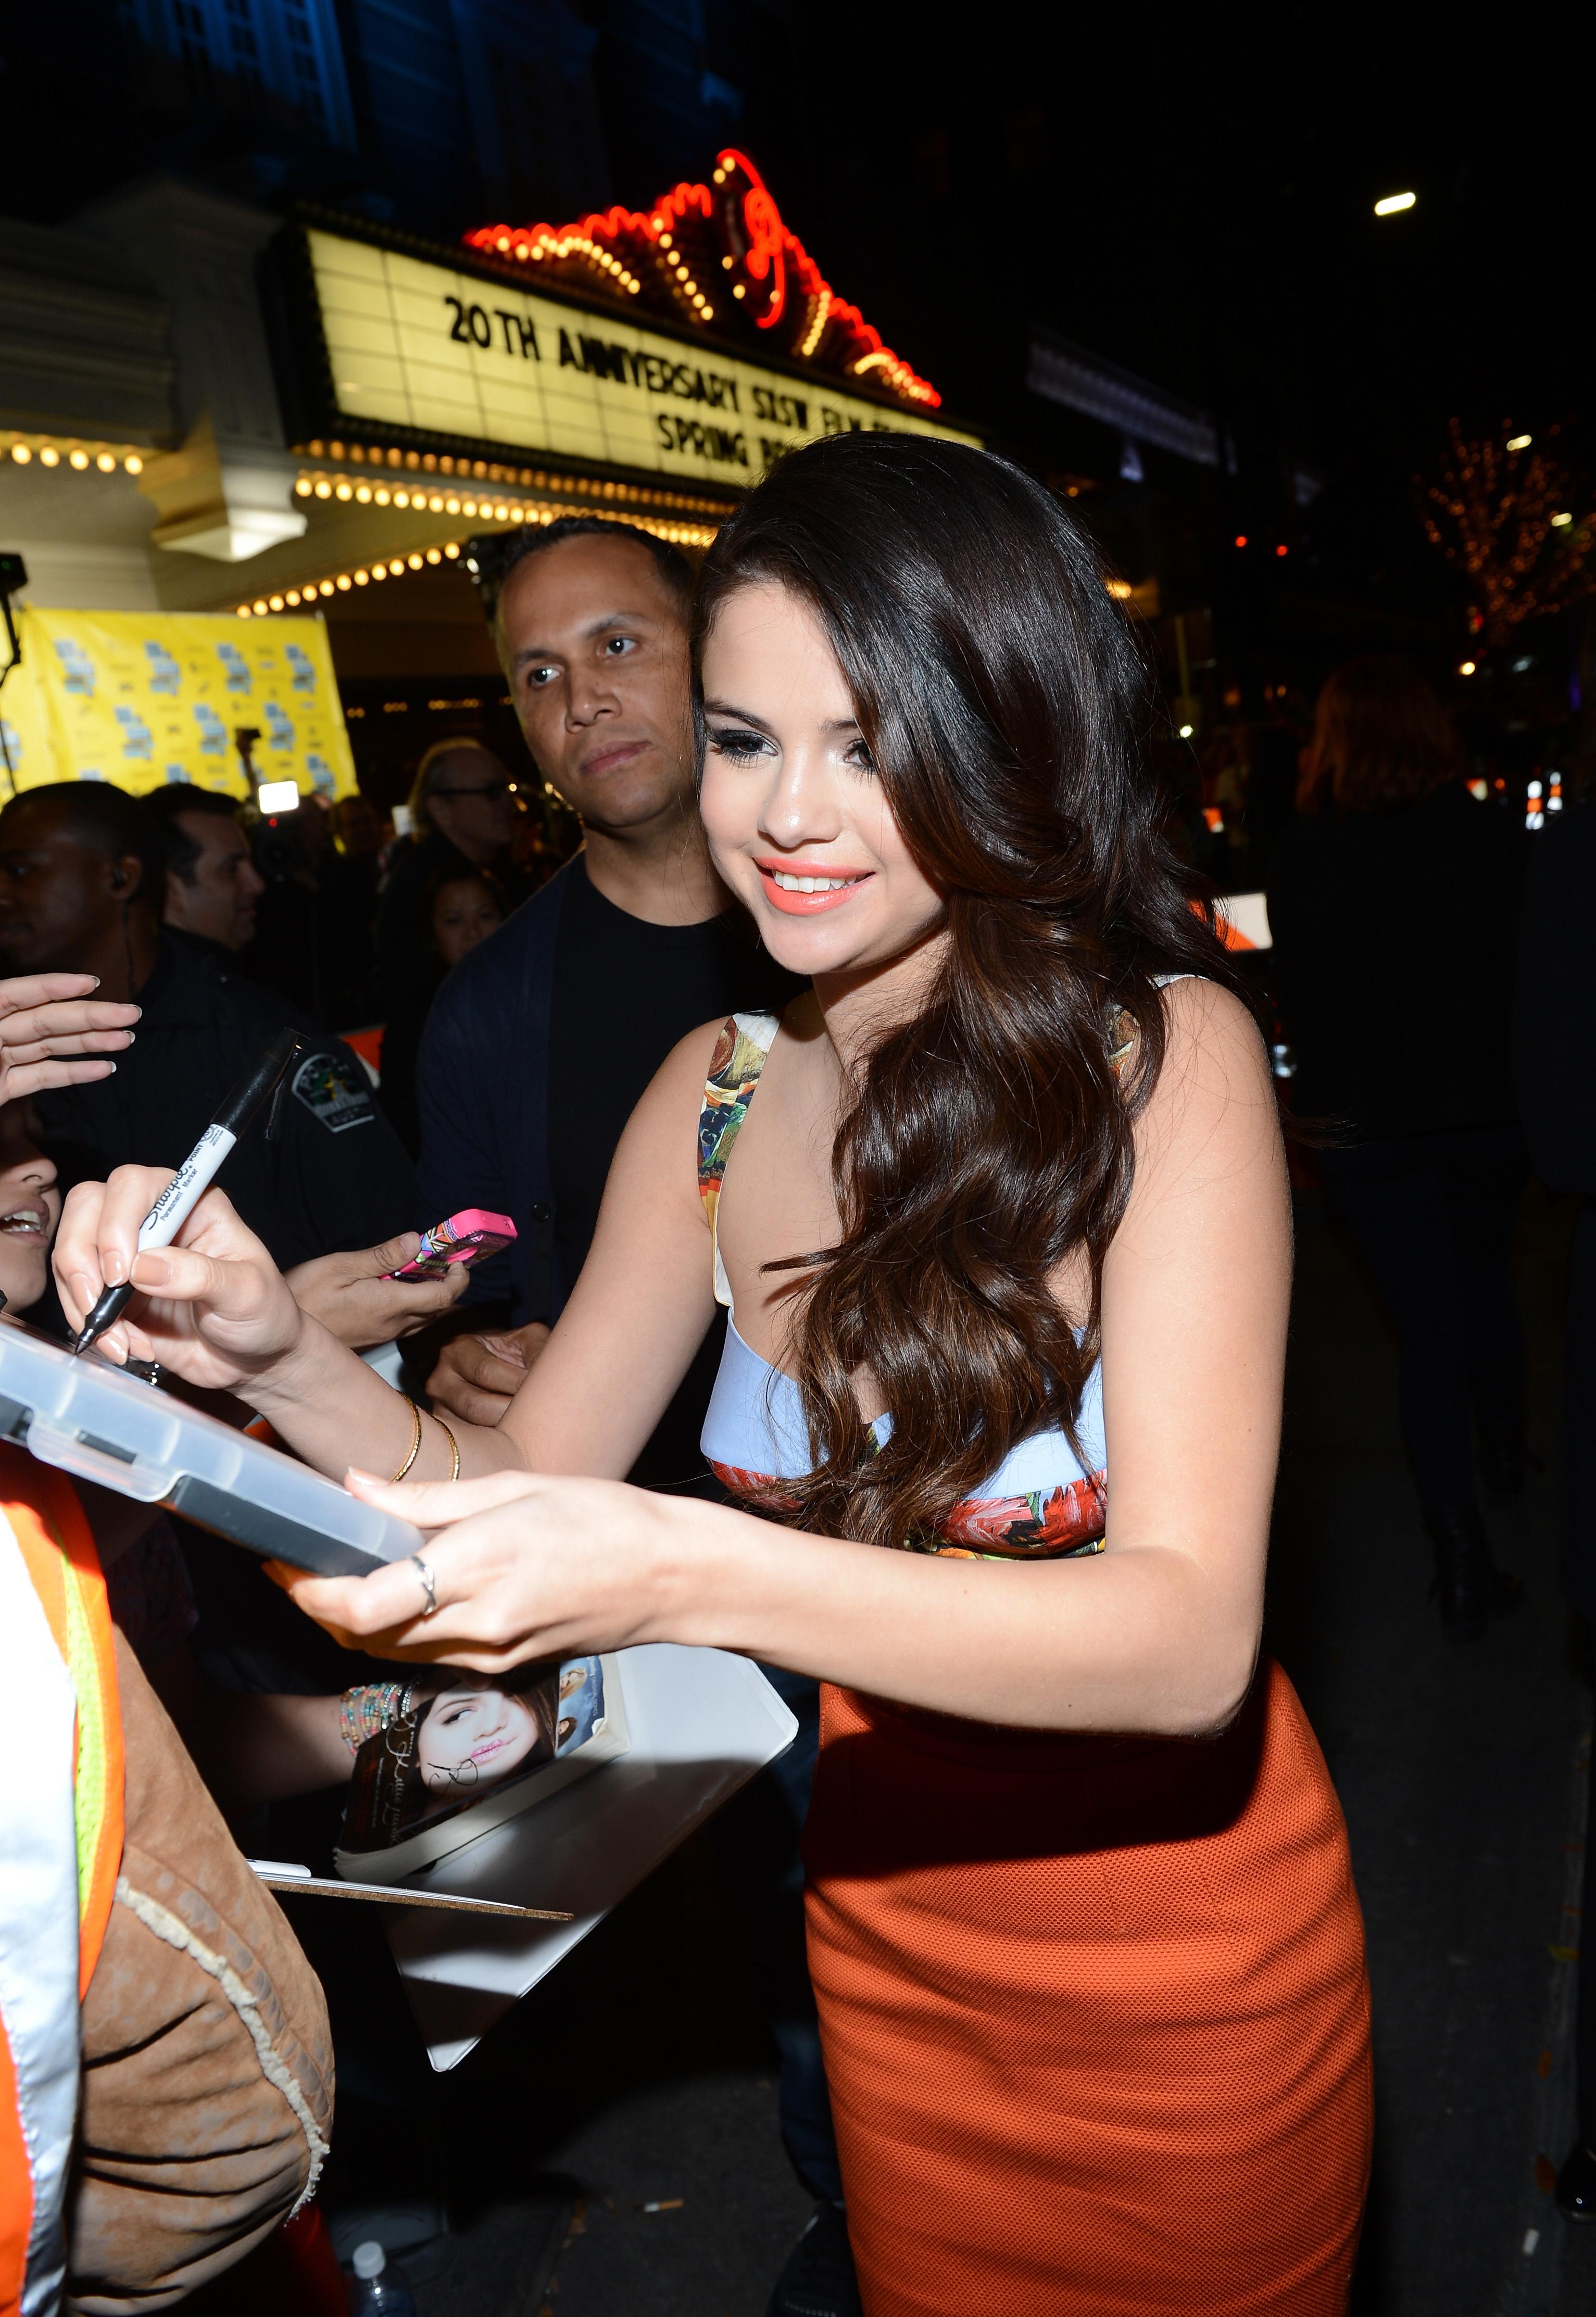 Selena Gomez signed autographs for fans at SXSW.